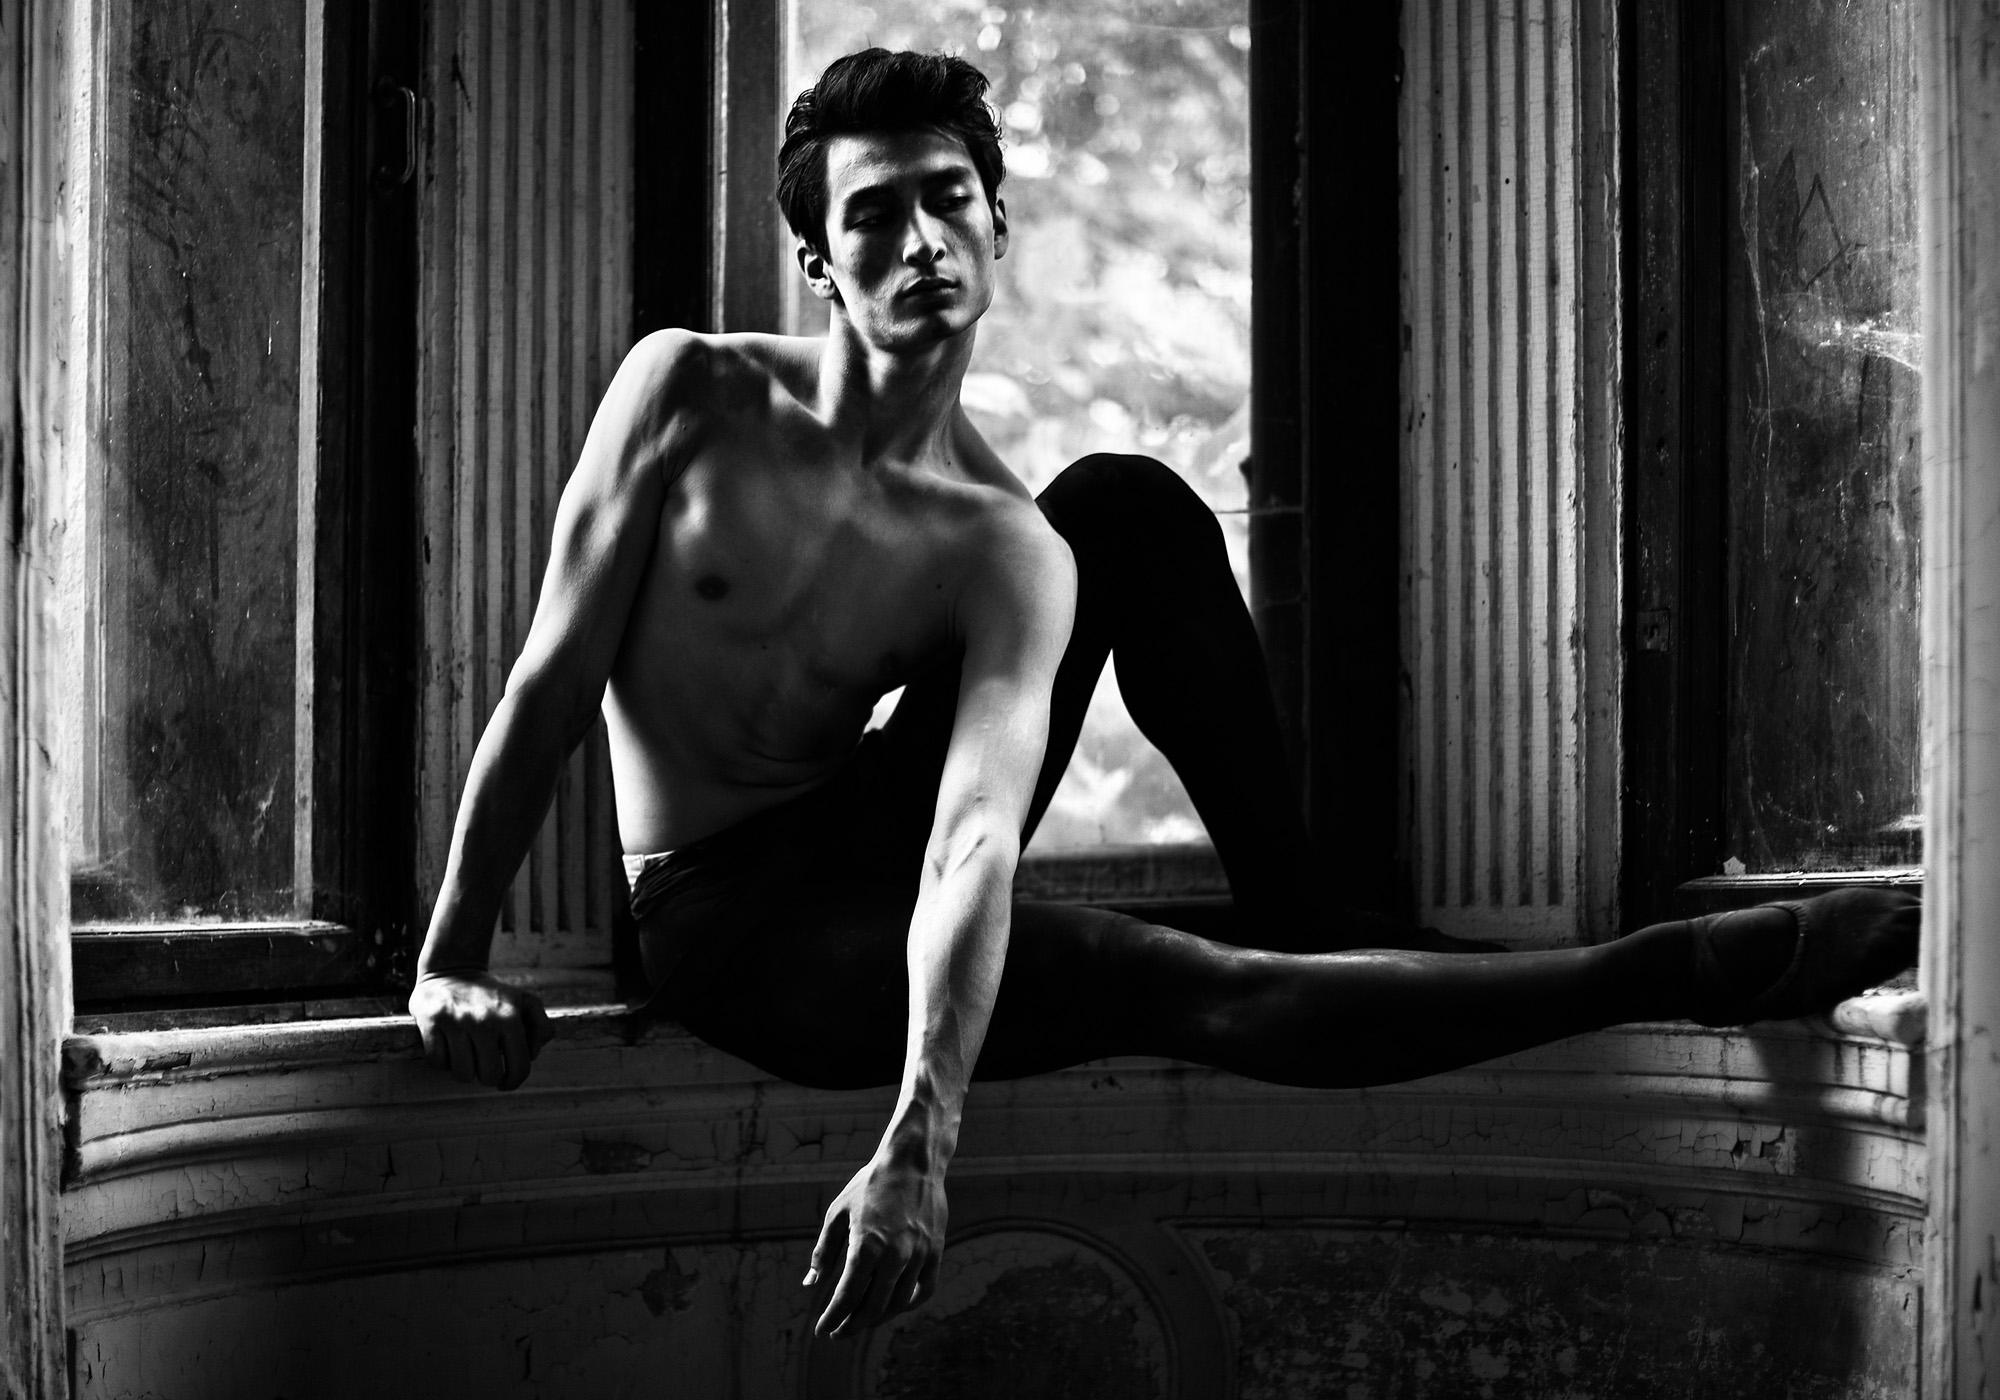 Танцоры / фотограф Данил Головкин